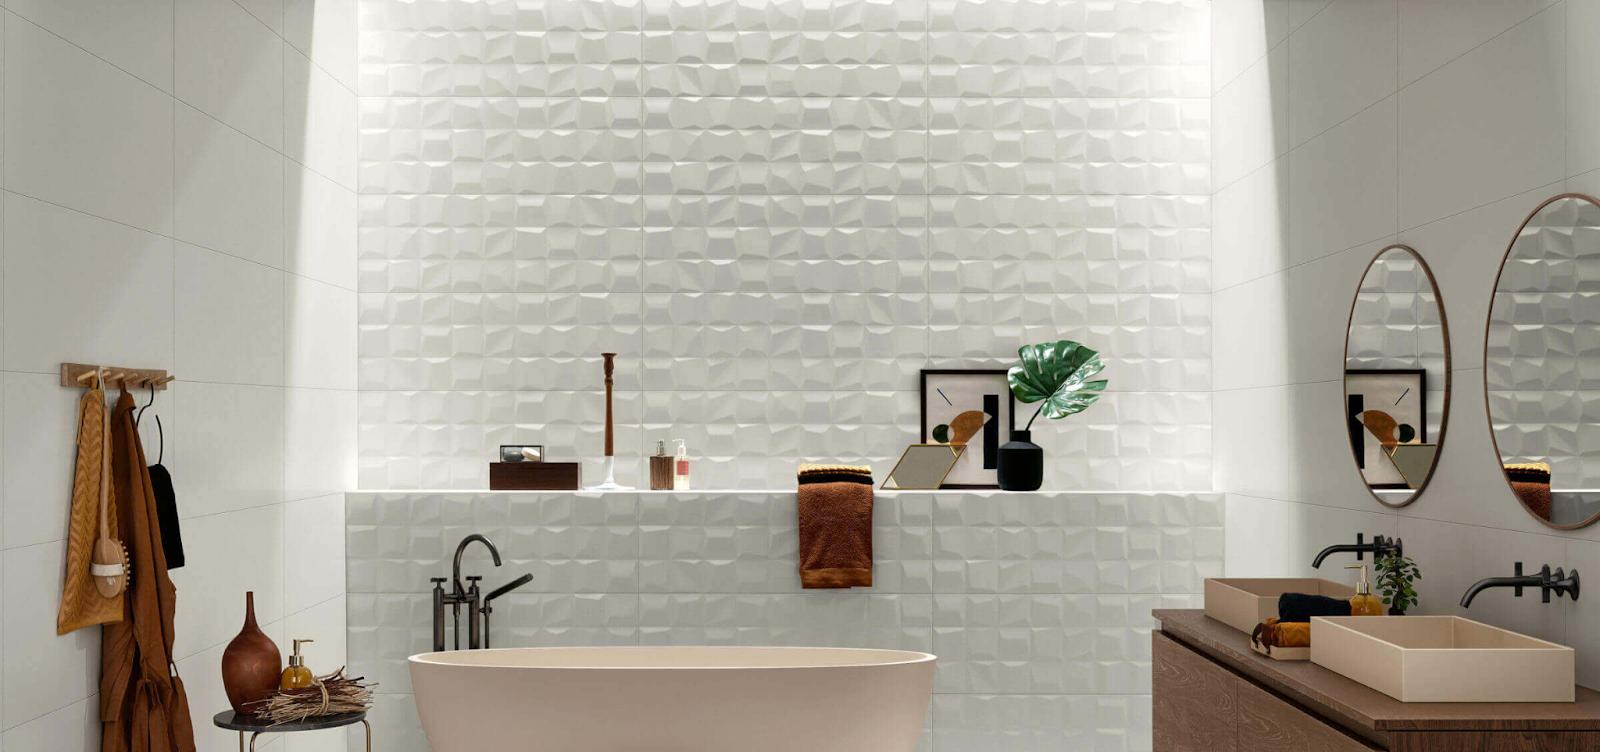 Bathroom wall with a three-dimensional white mosaic tile grid